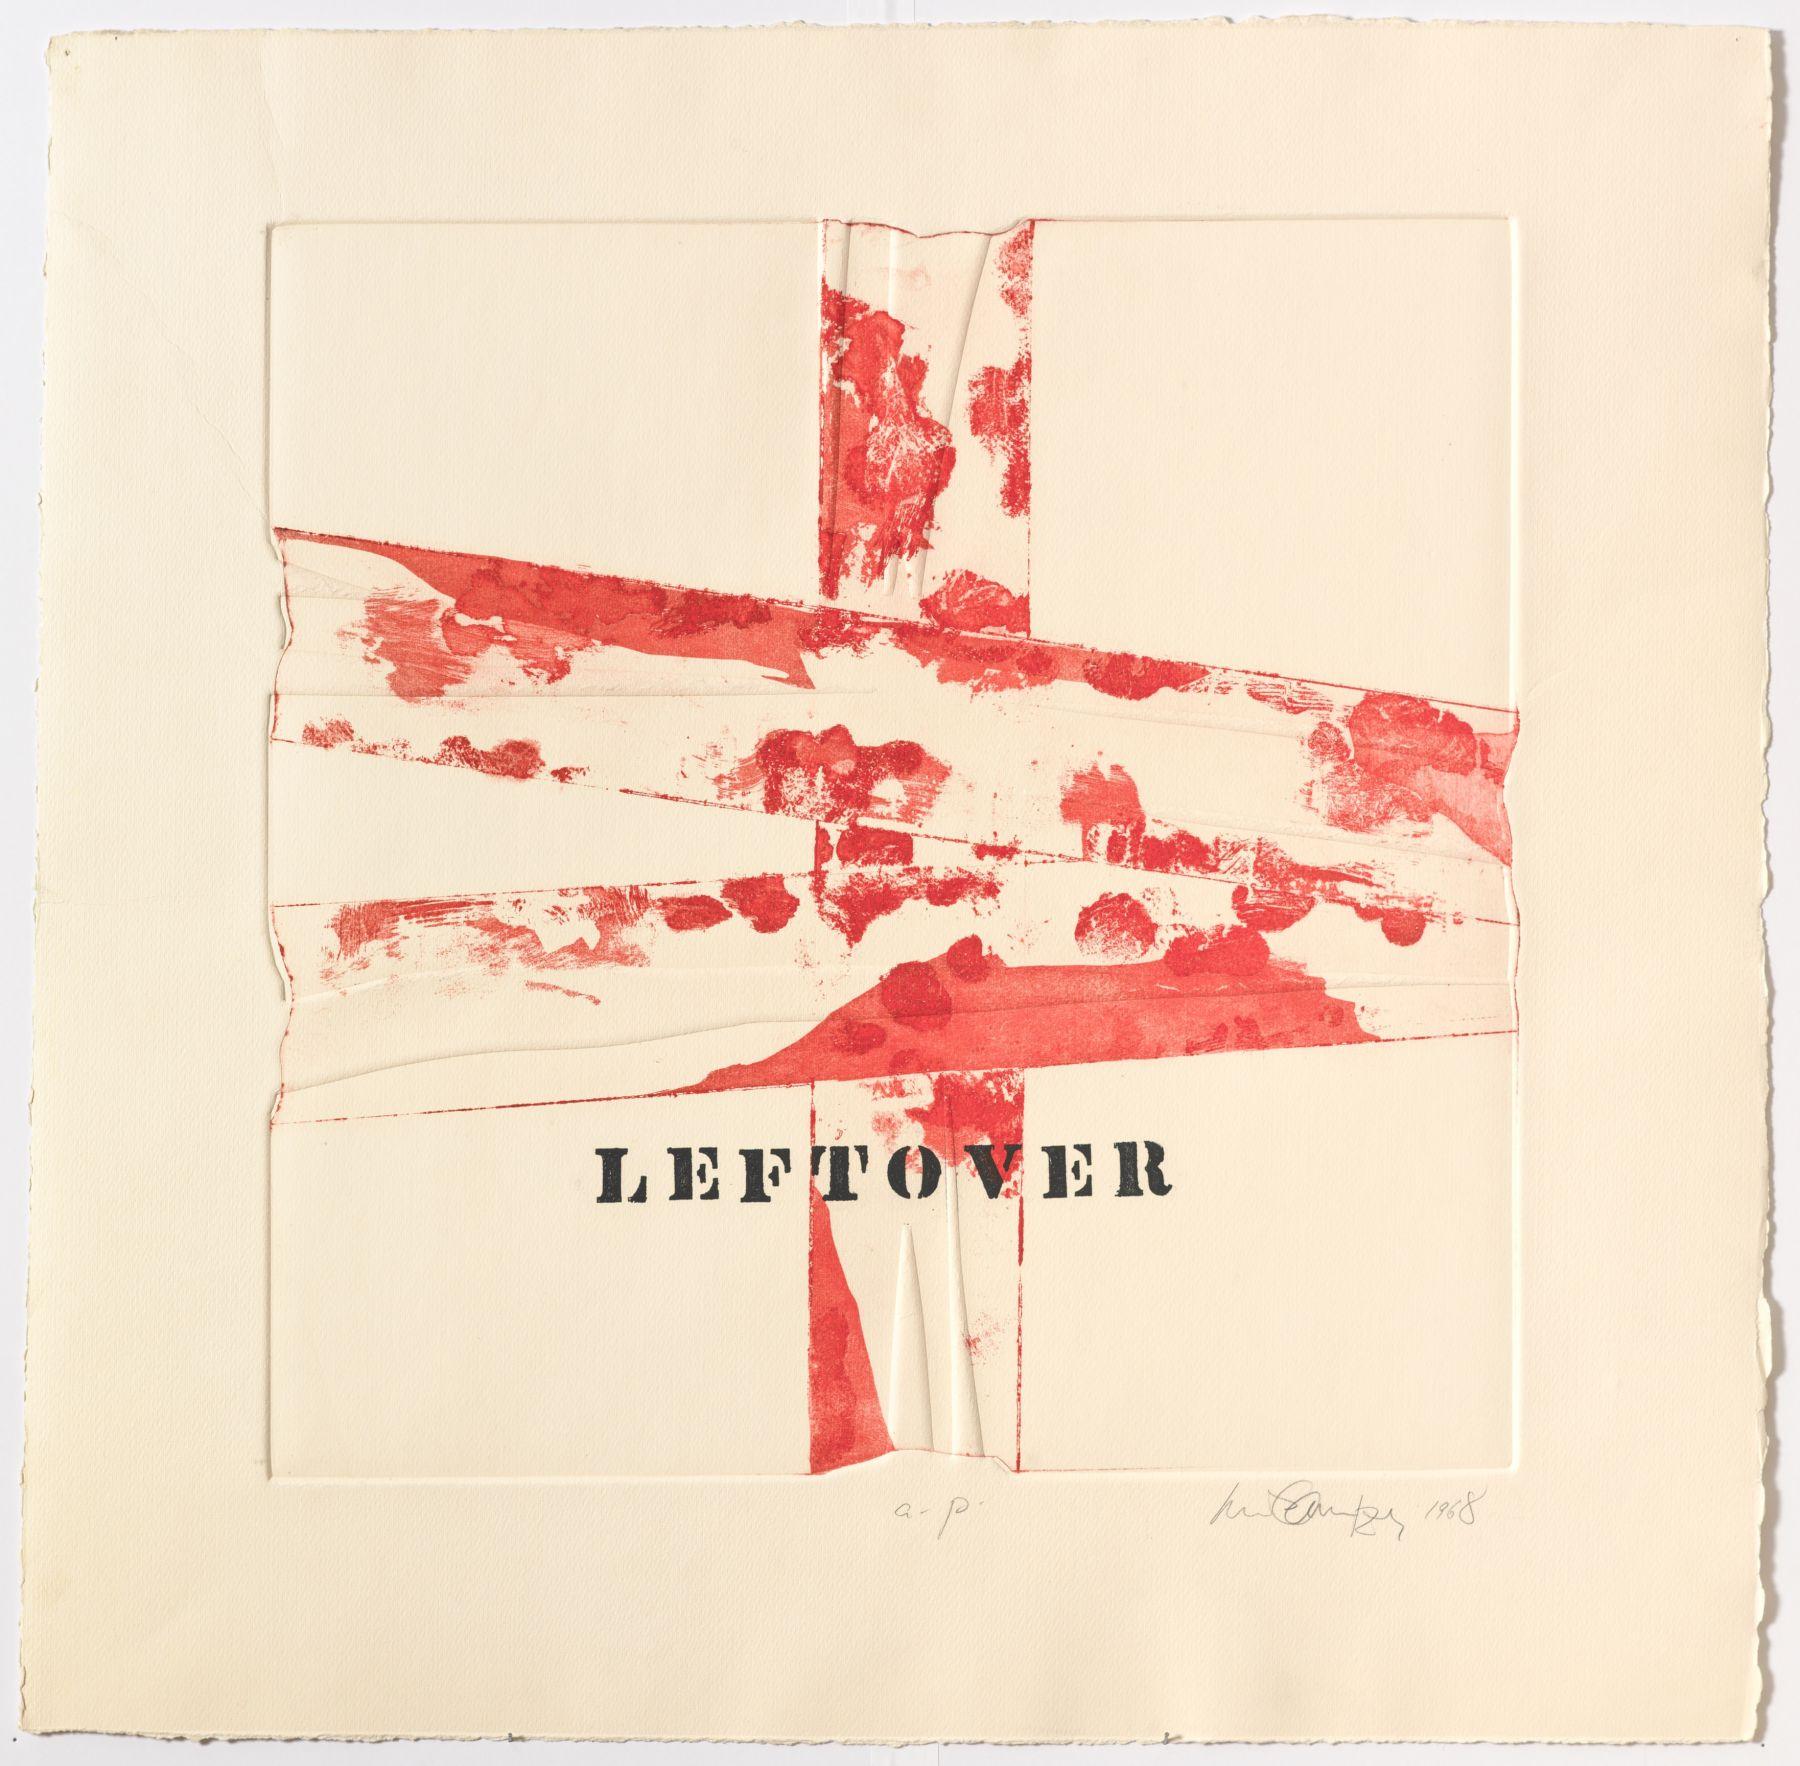 Luis Camnitzer, Leftover, 1968